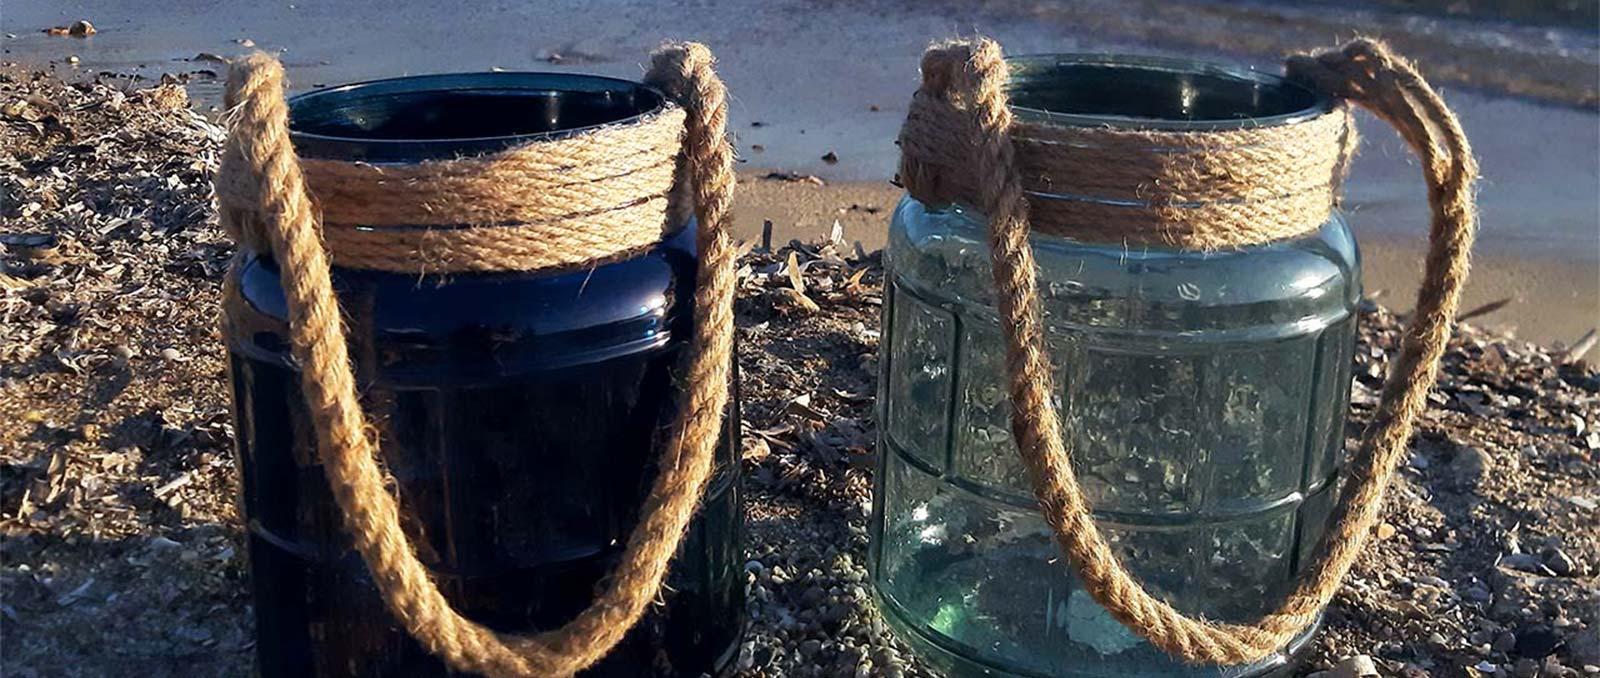 lanterns-glass-blue-rope